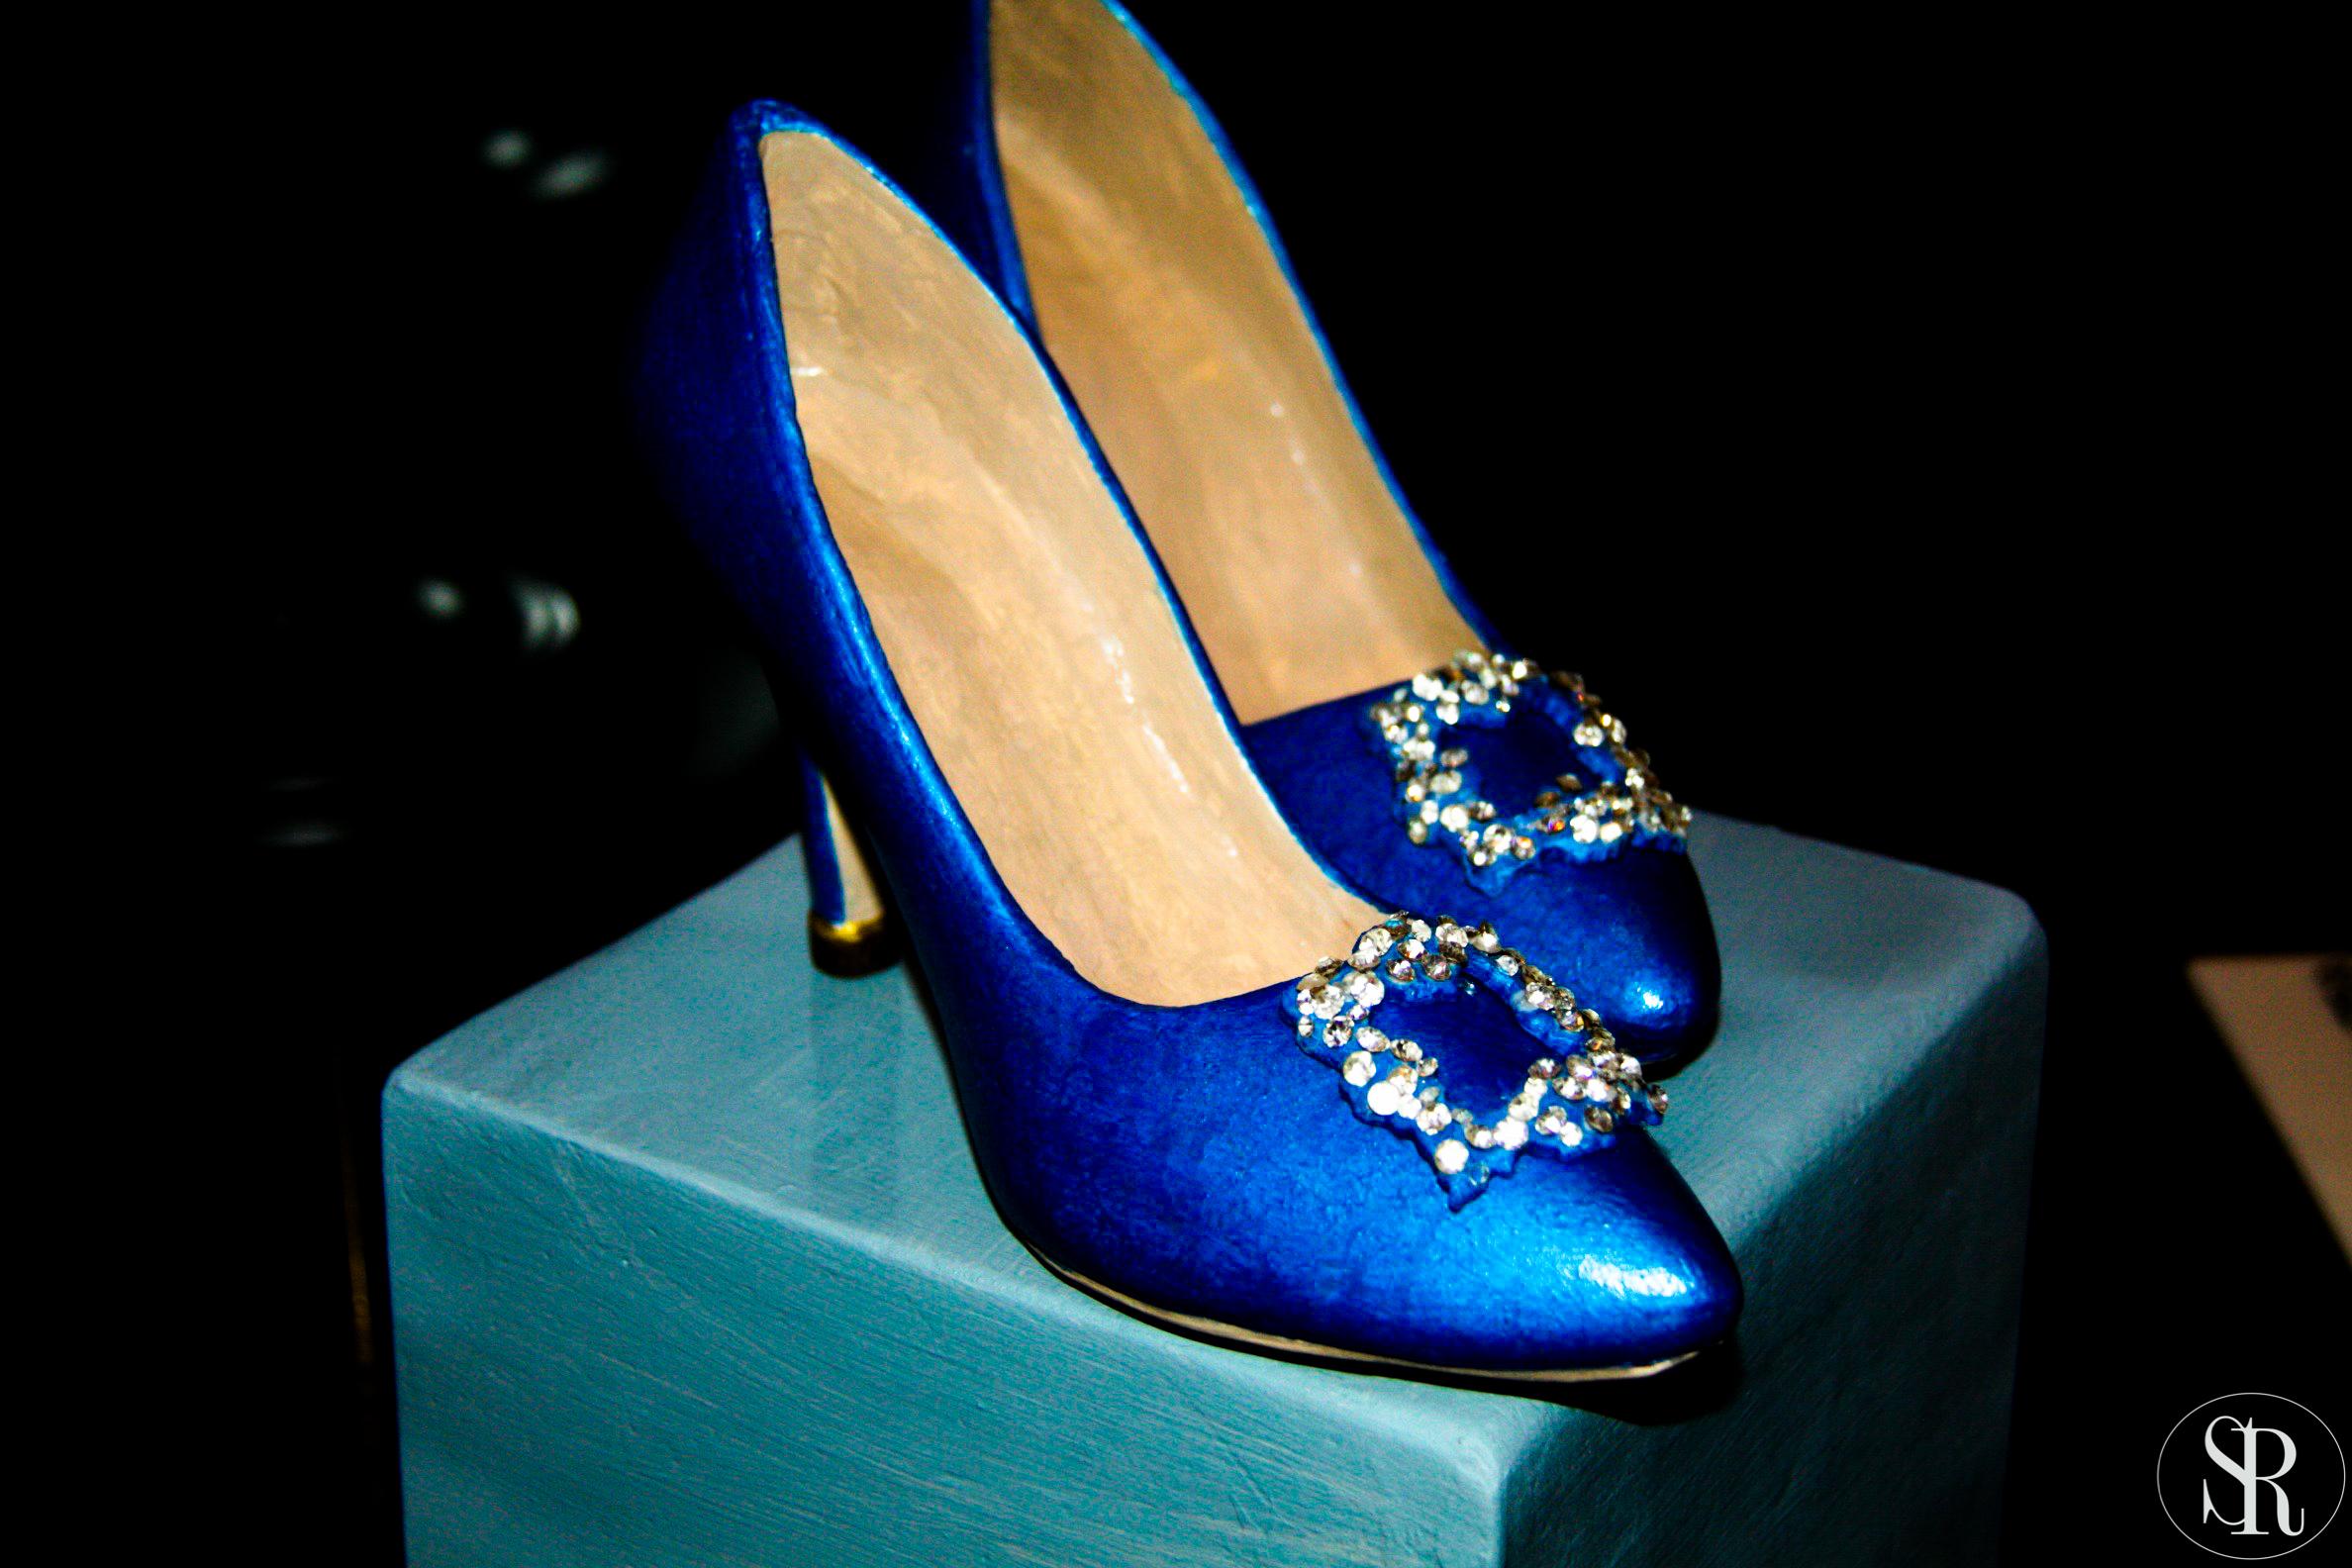 VIP launch of MANOLO BLAHNIK collection Fashion Afternoon Tea by Raffles Dubai-4007.jpg